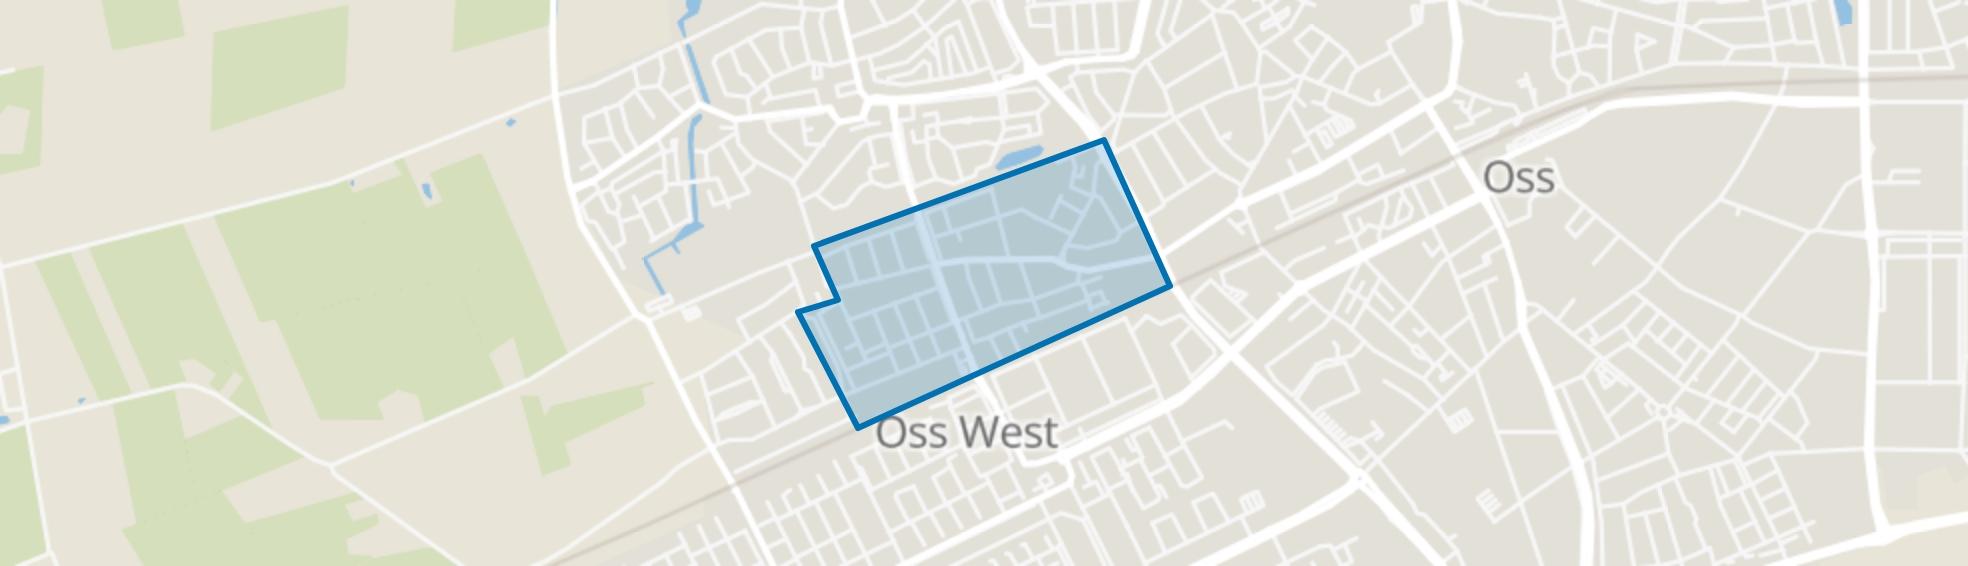 Vlashoek, Oss map